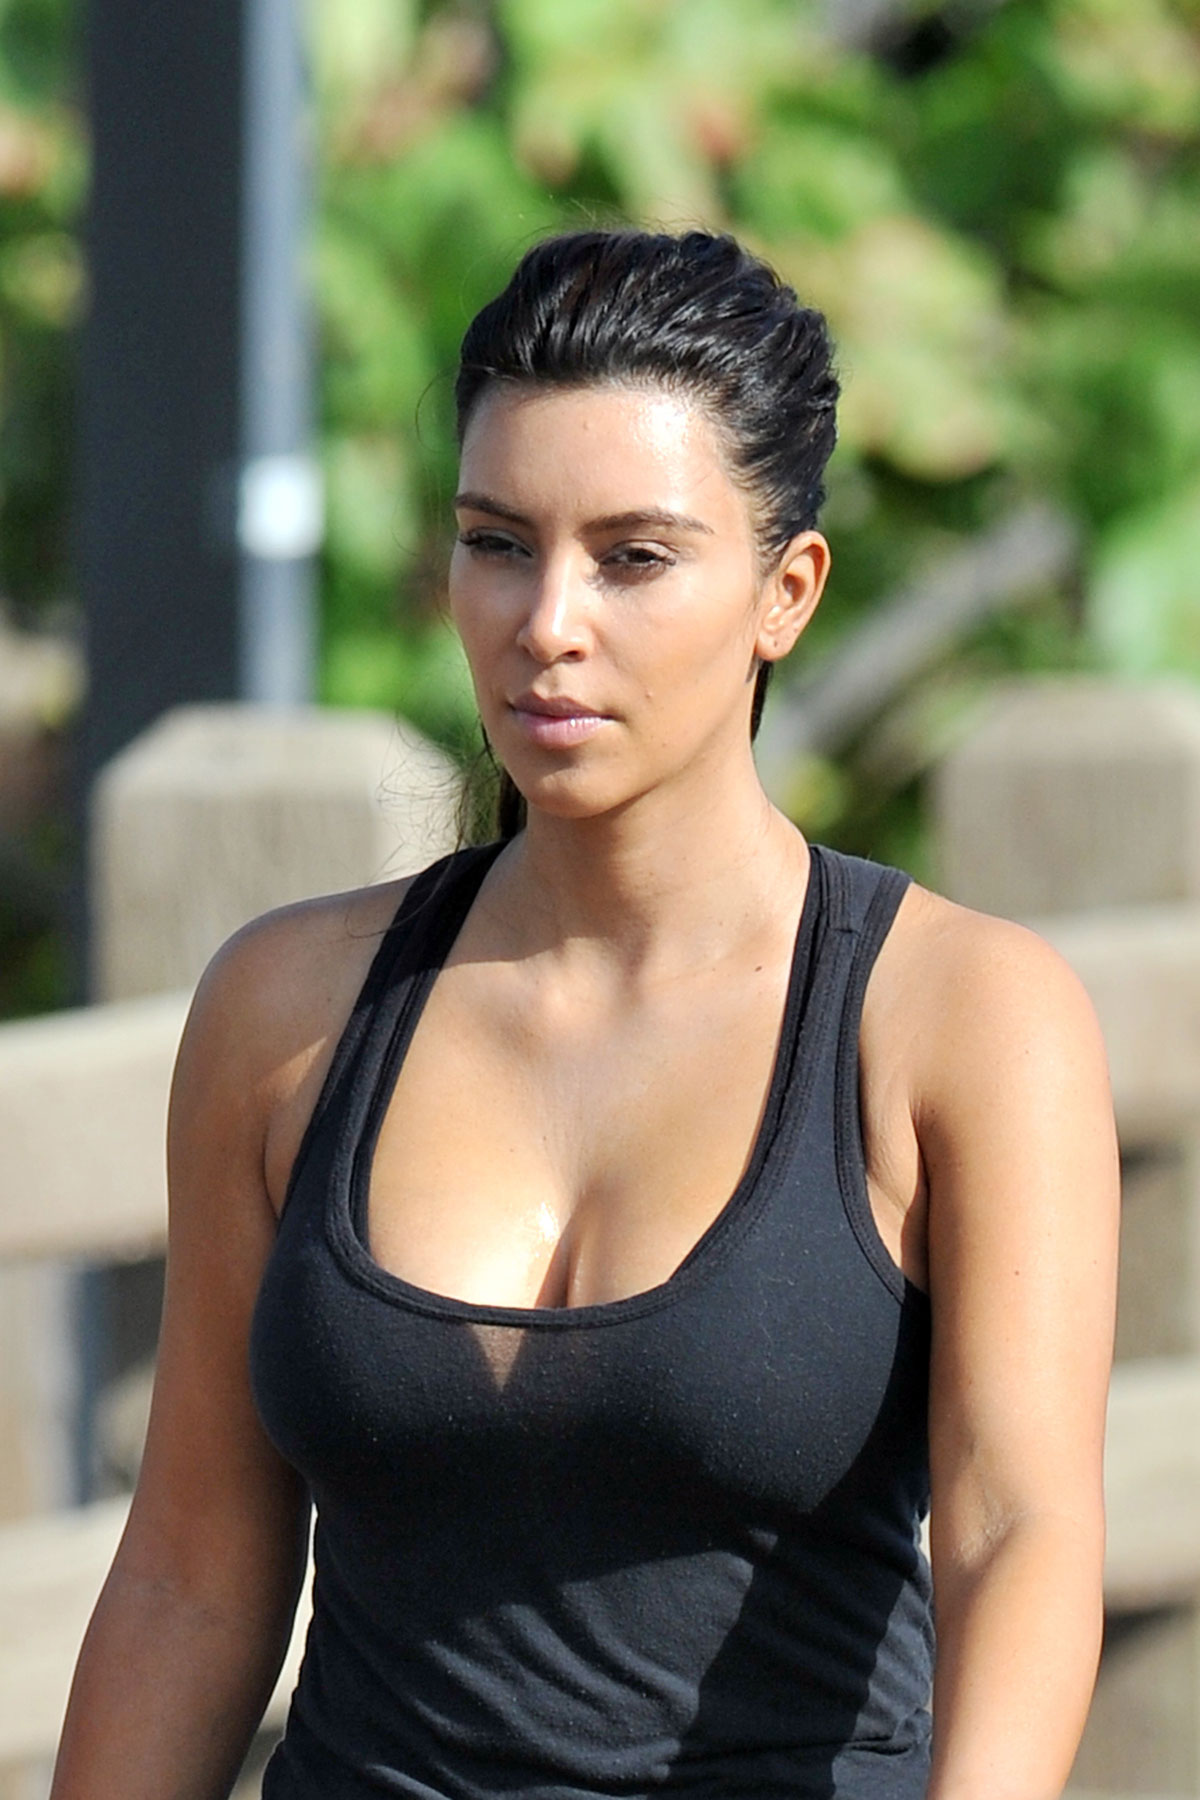 KIM KARDASHIAN on the ... Kim Kardashian